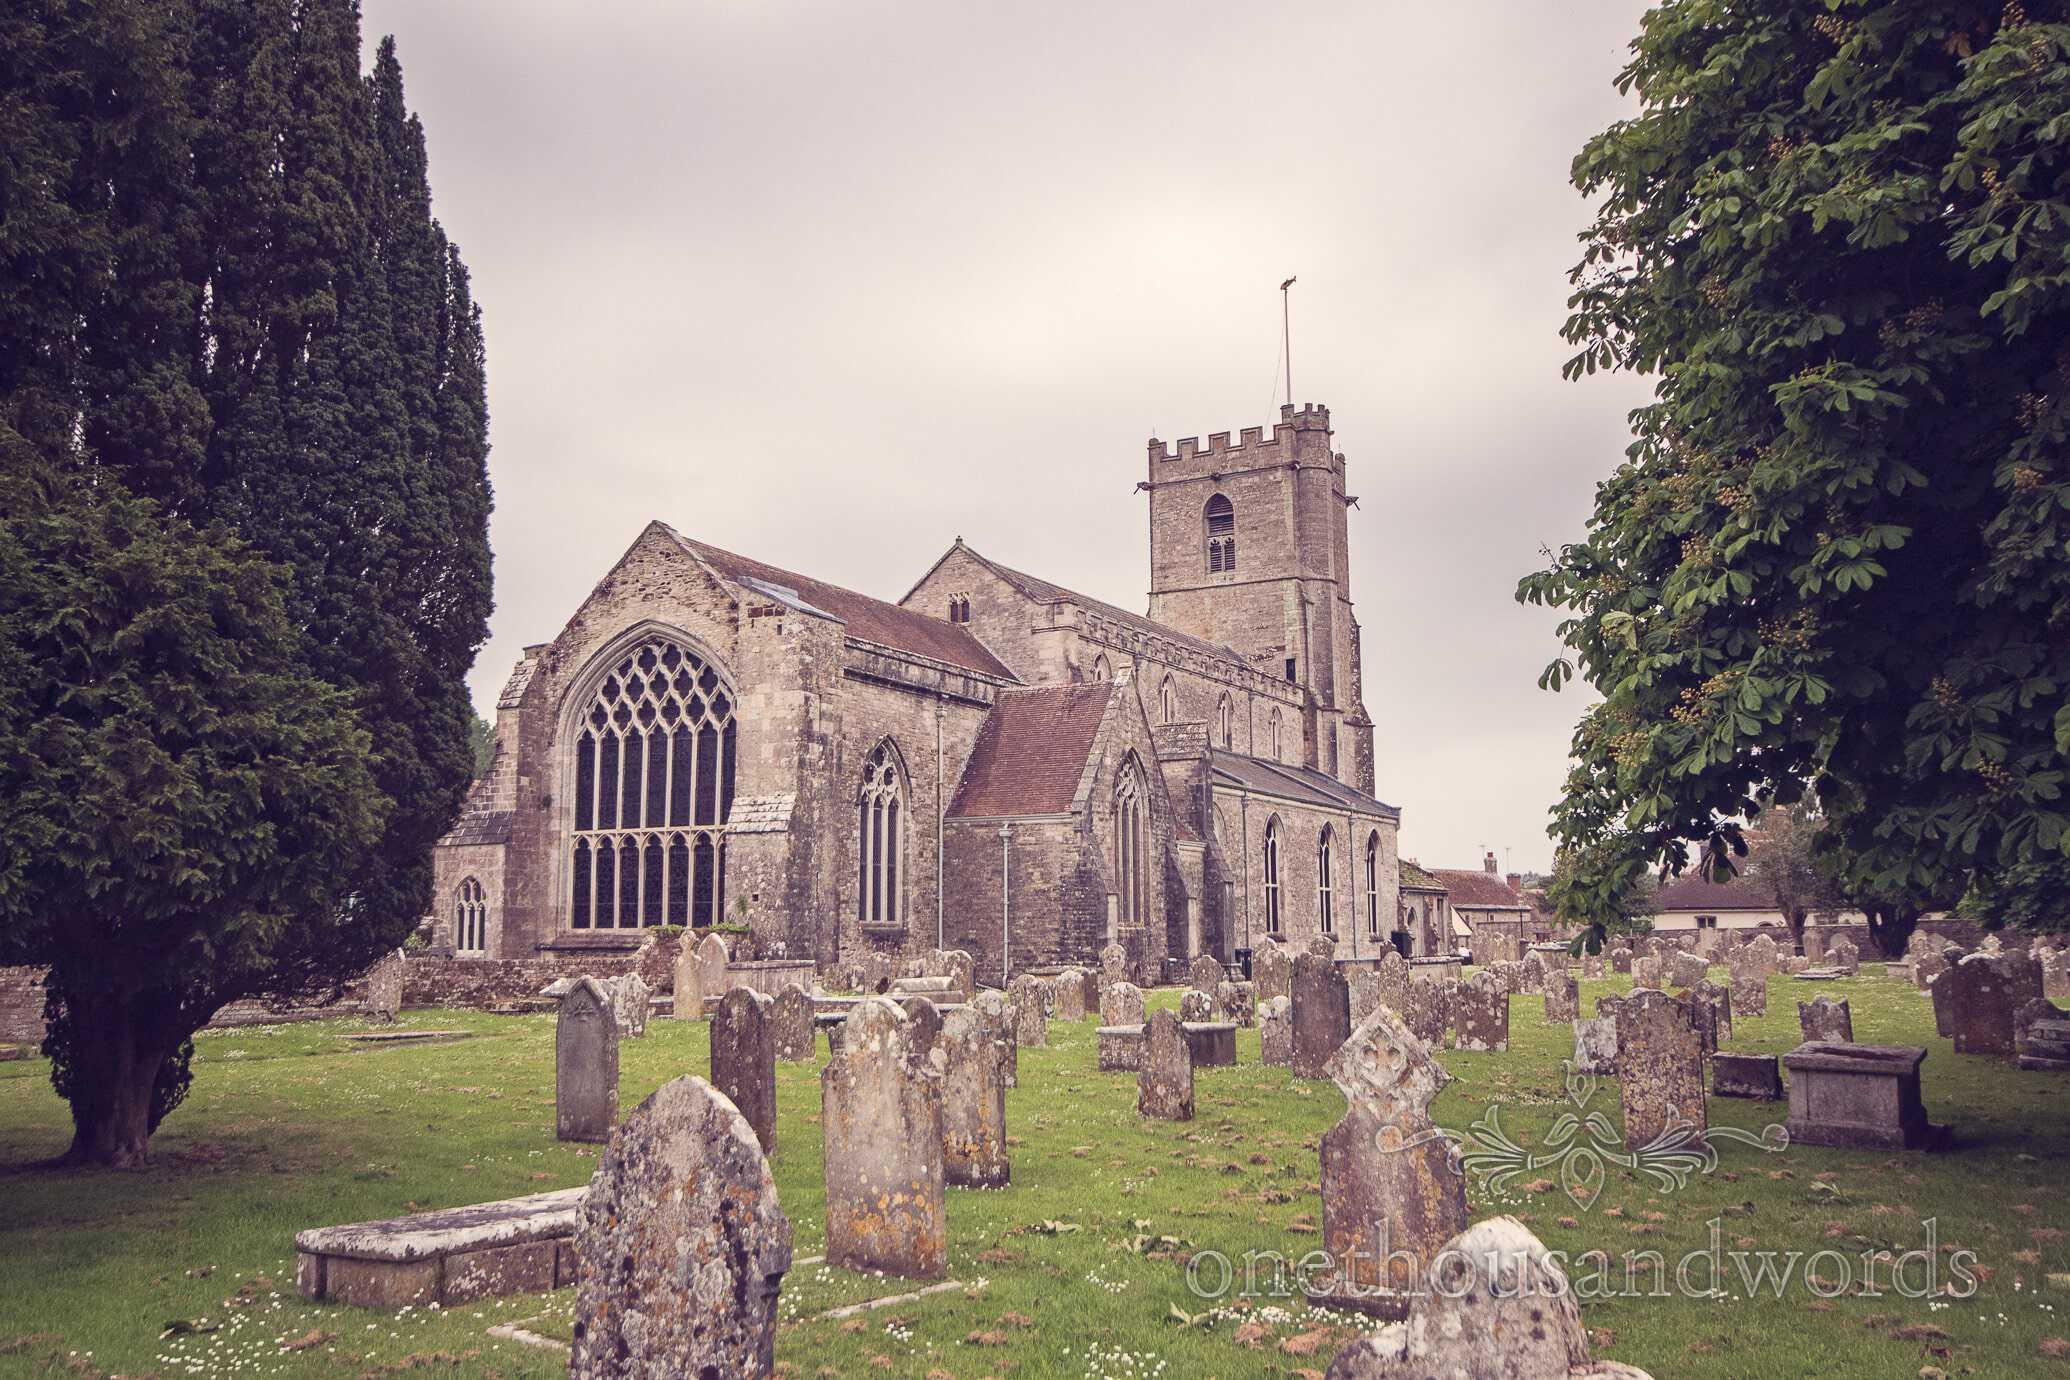 Lady St. Mary Church, Wareham, Dorset on wedding morning